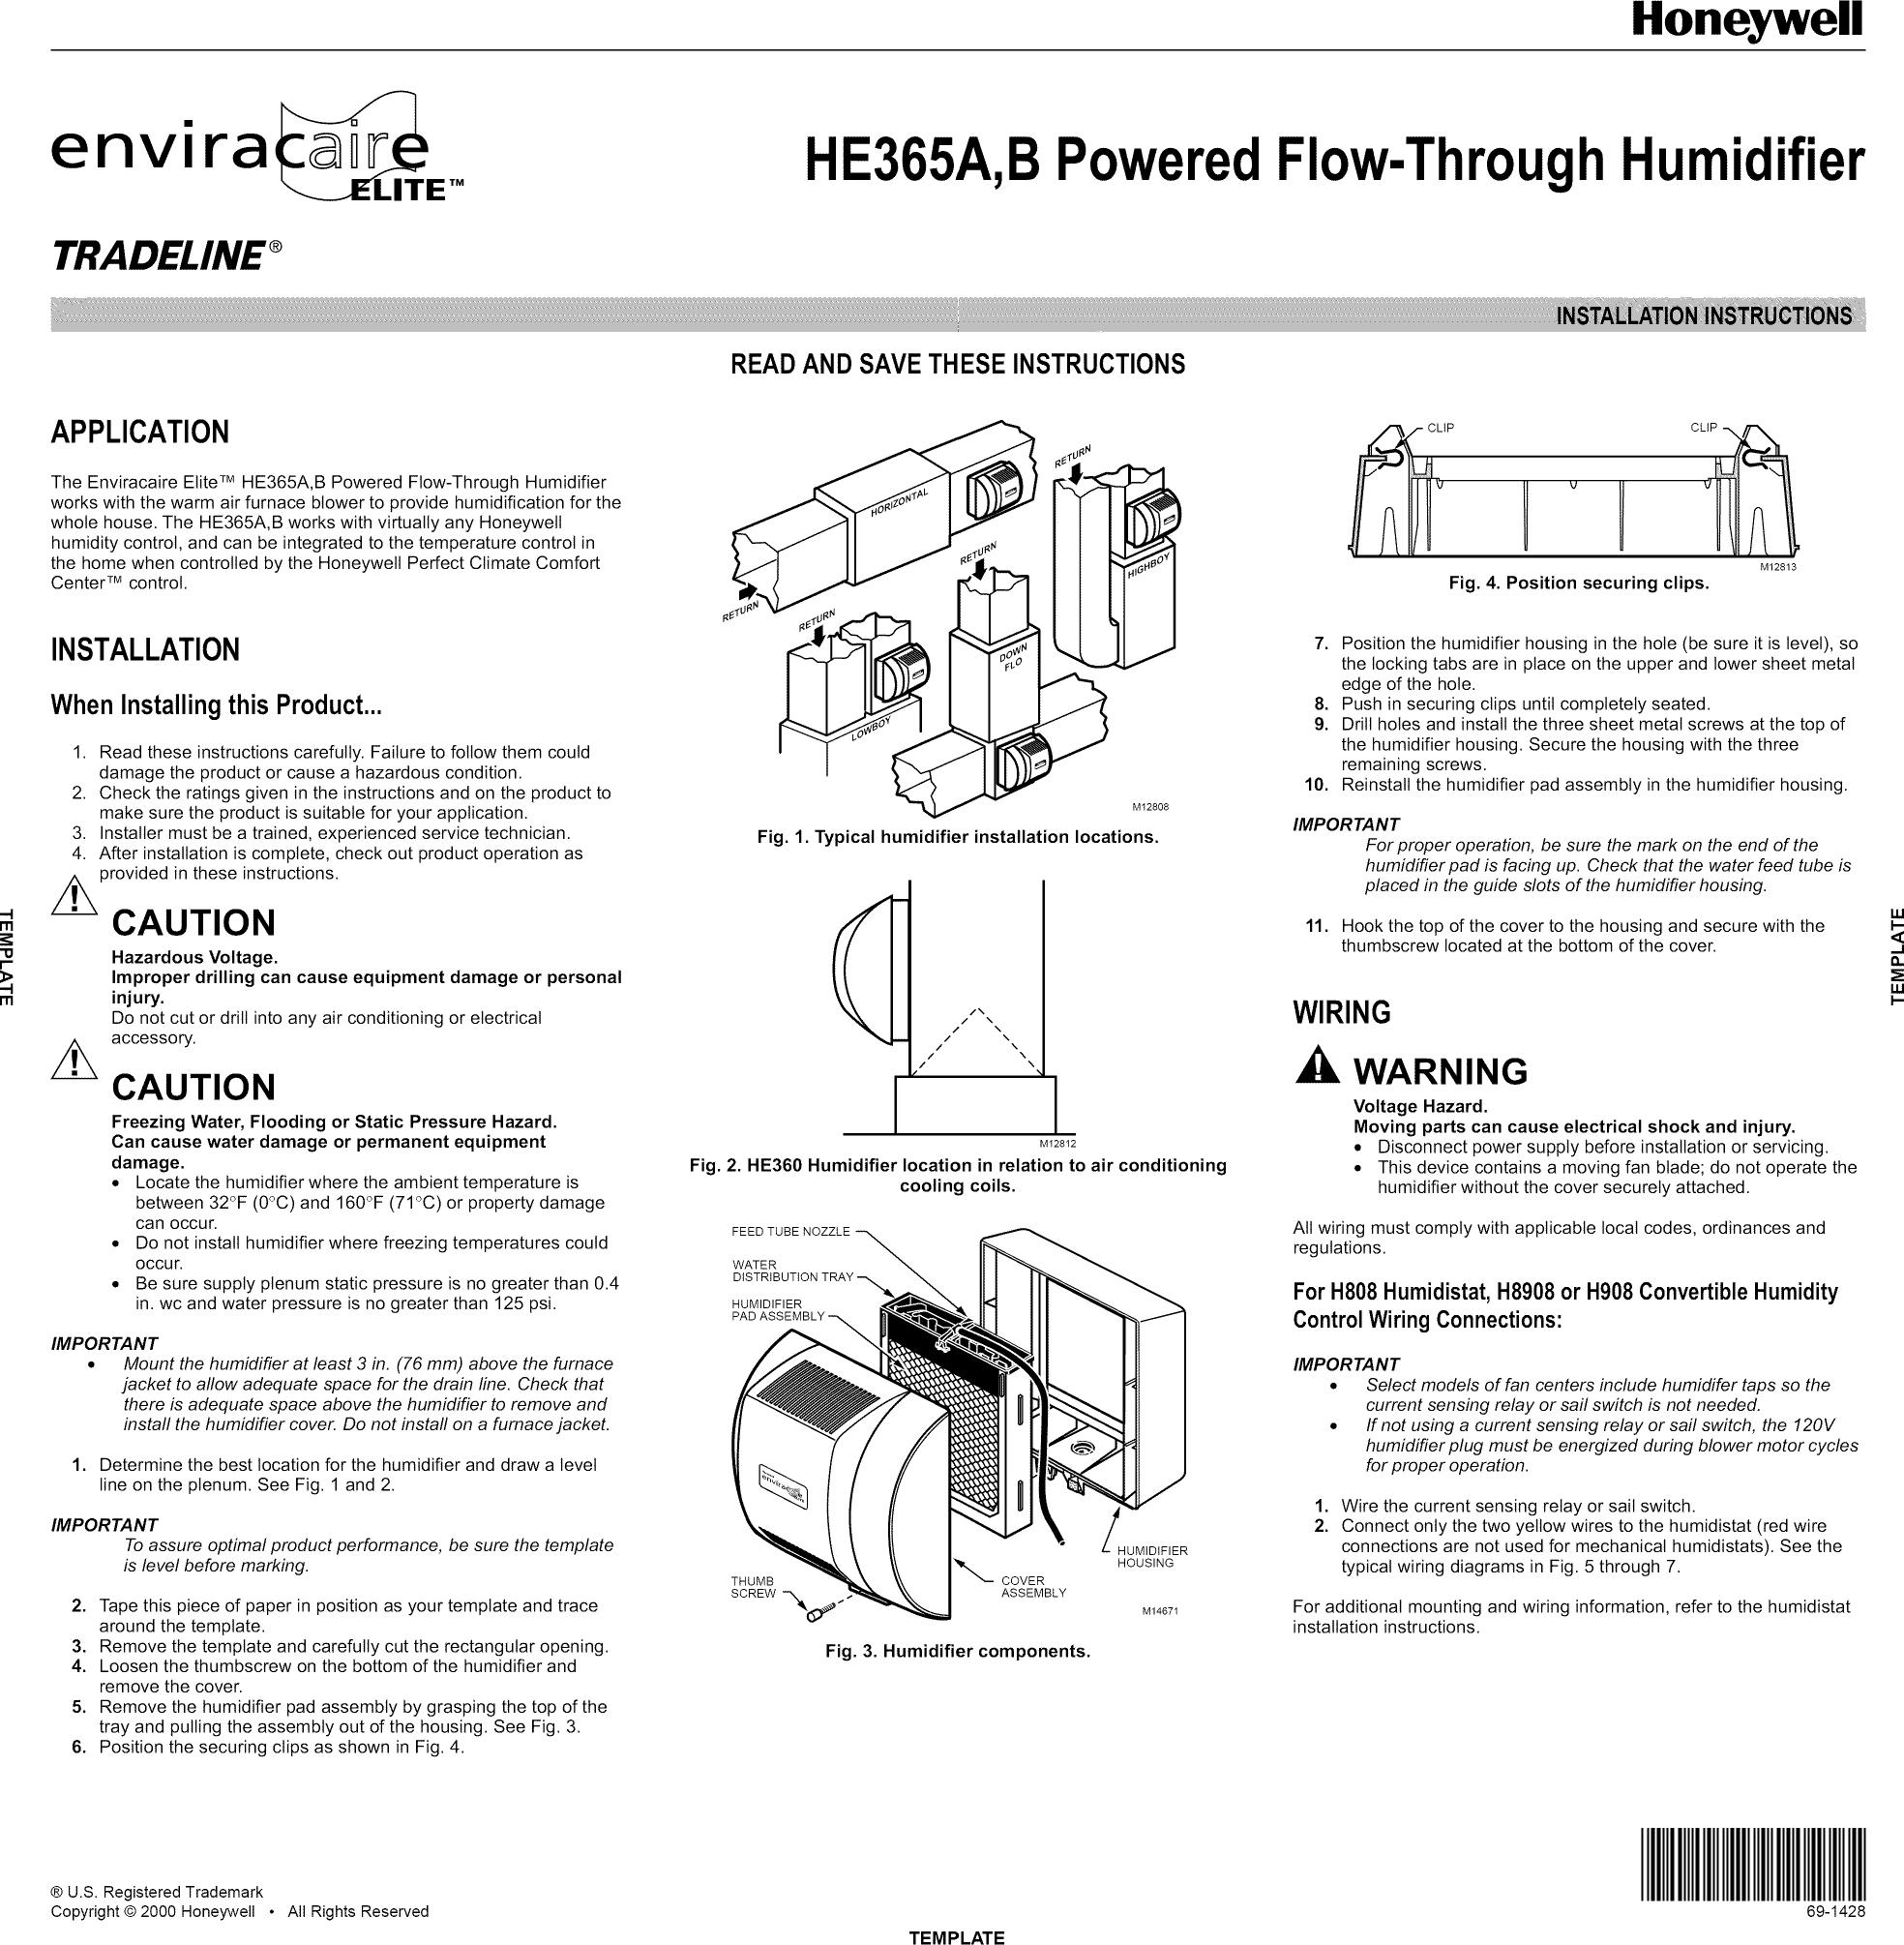 2004 Lincoln Town Car Fuse Box Diagram Wiki Schematics Wiring 1993 Navigator Diagramfor Janitrol Furnace 1992